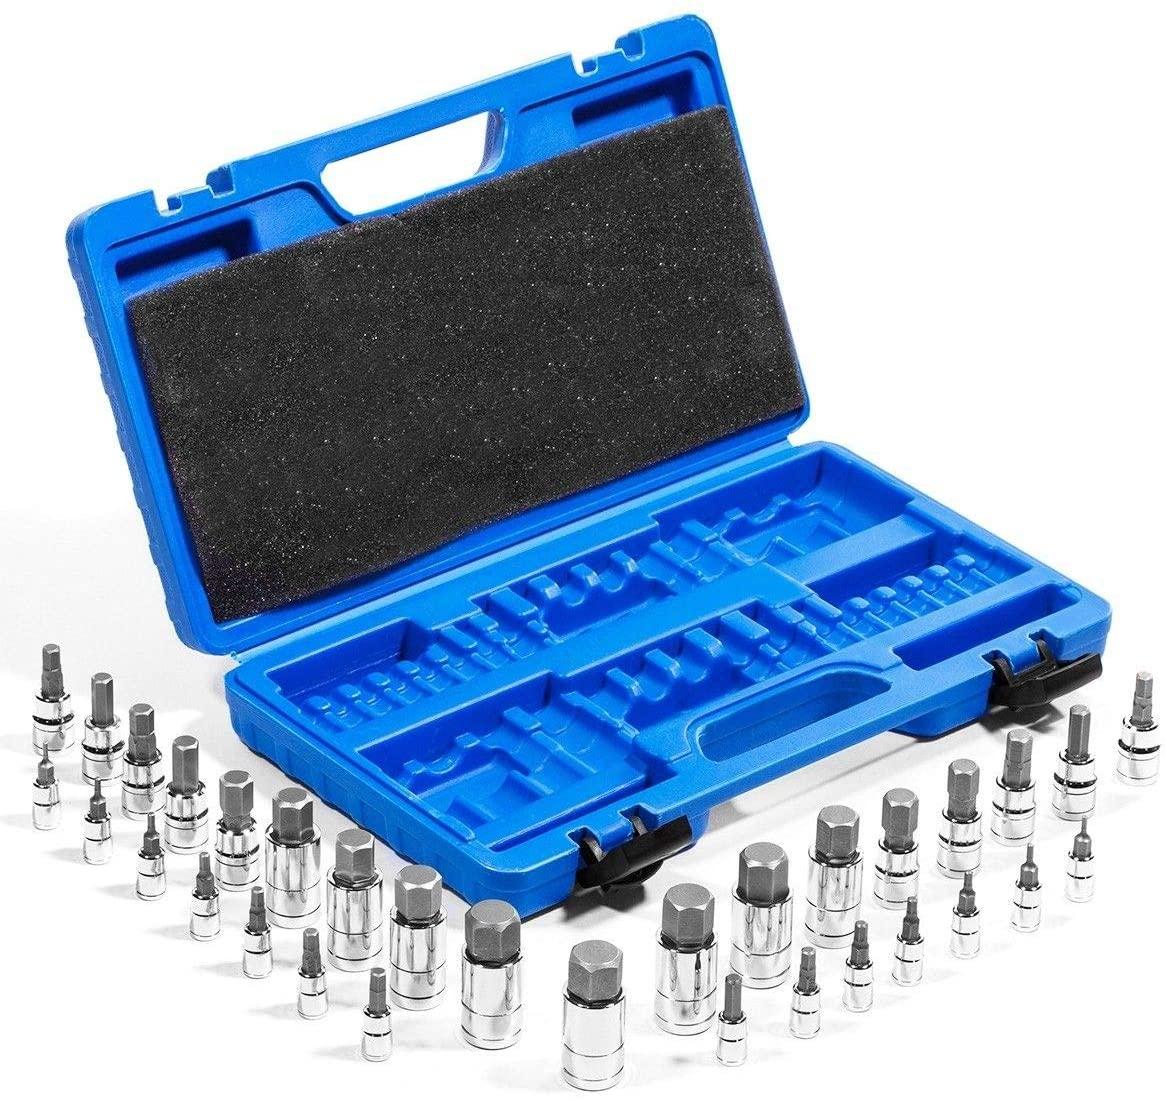 Stark 32-PCS Master Hex Bit Socket Set S2 Steel SAE And Metric Allen Socket Bit, 5/64-inch to 3/4-inch, 2mm to 19mm Socket Tool Kit